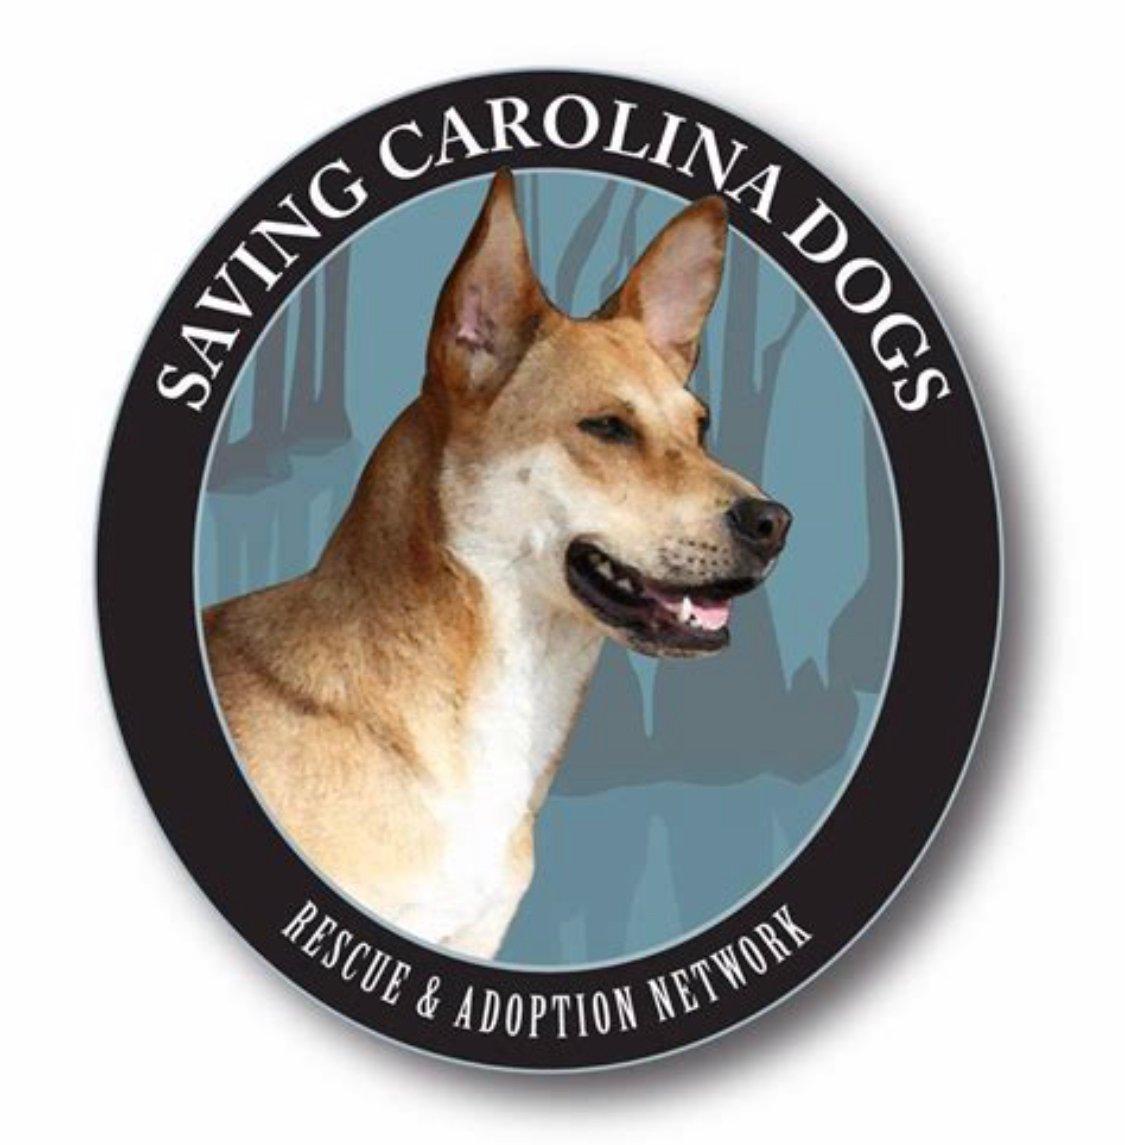 Saving Carolina Dogs Rescue and Adoption Network